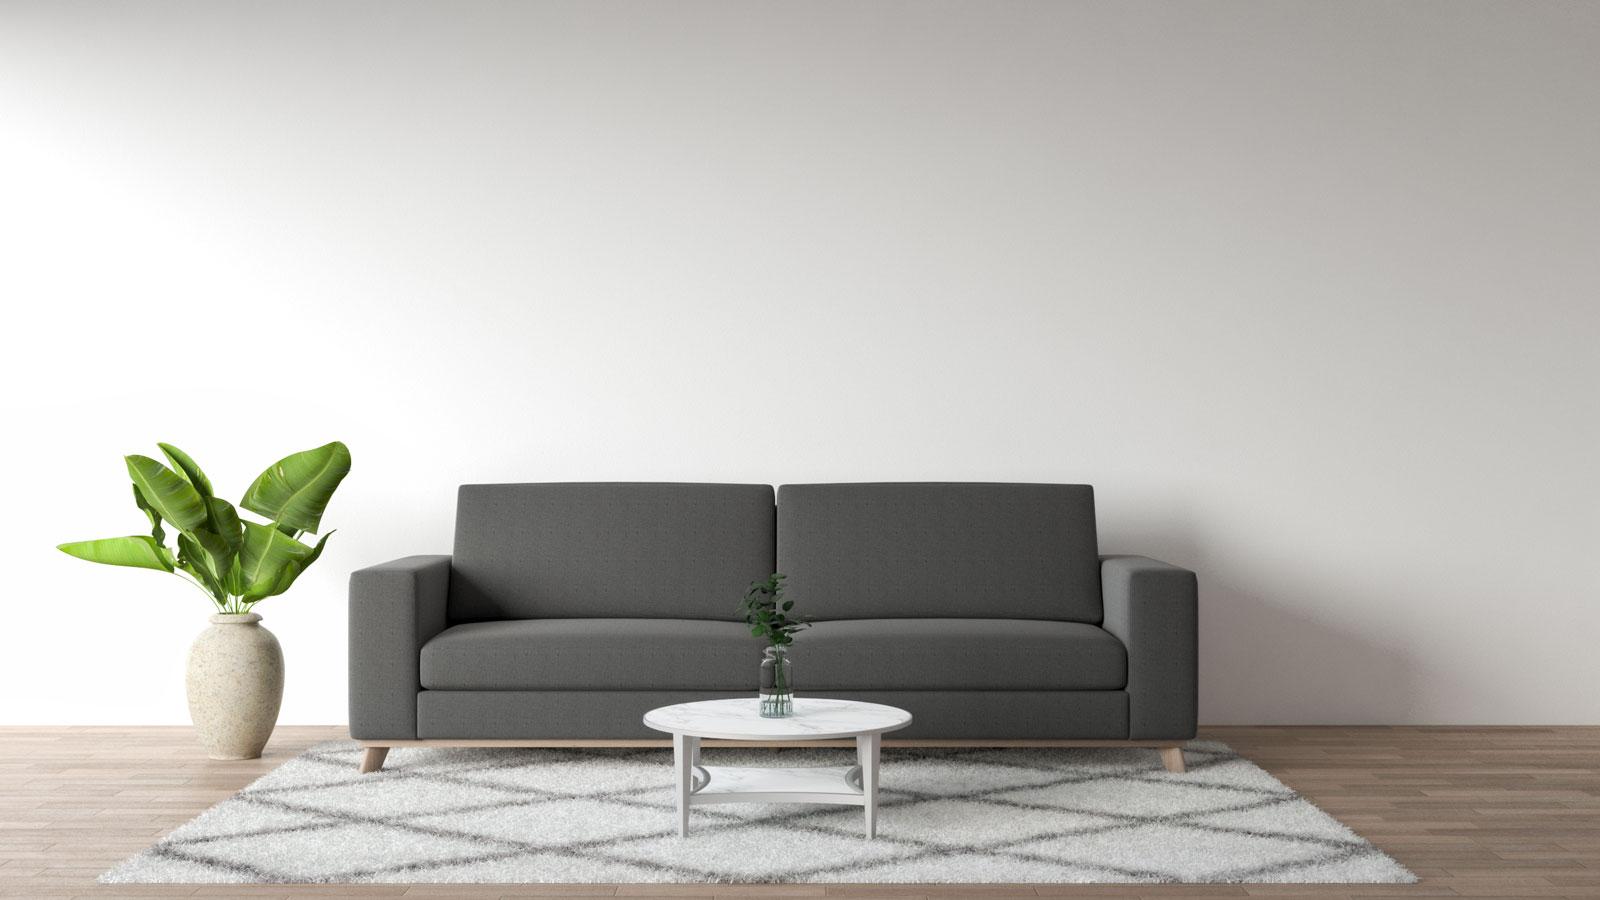 dark grey sofa with white area rug